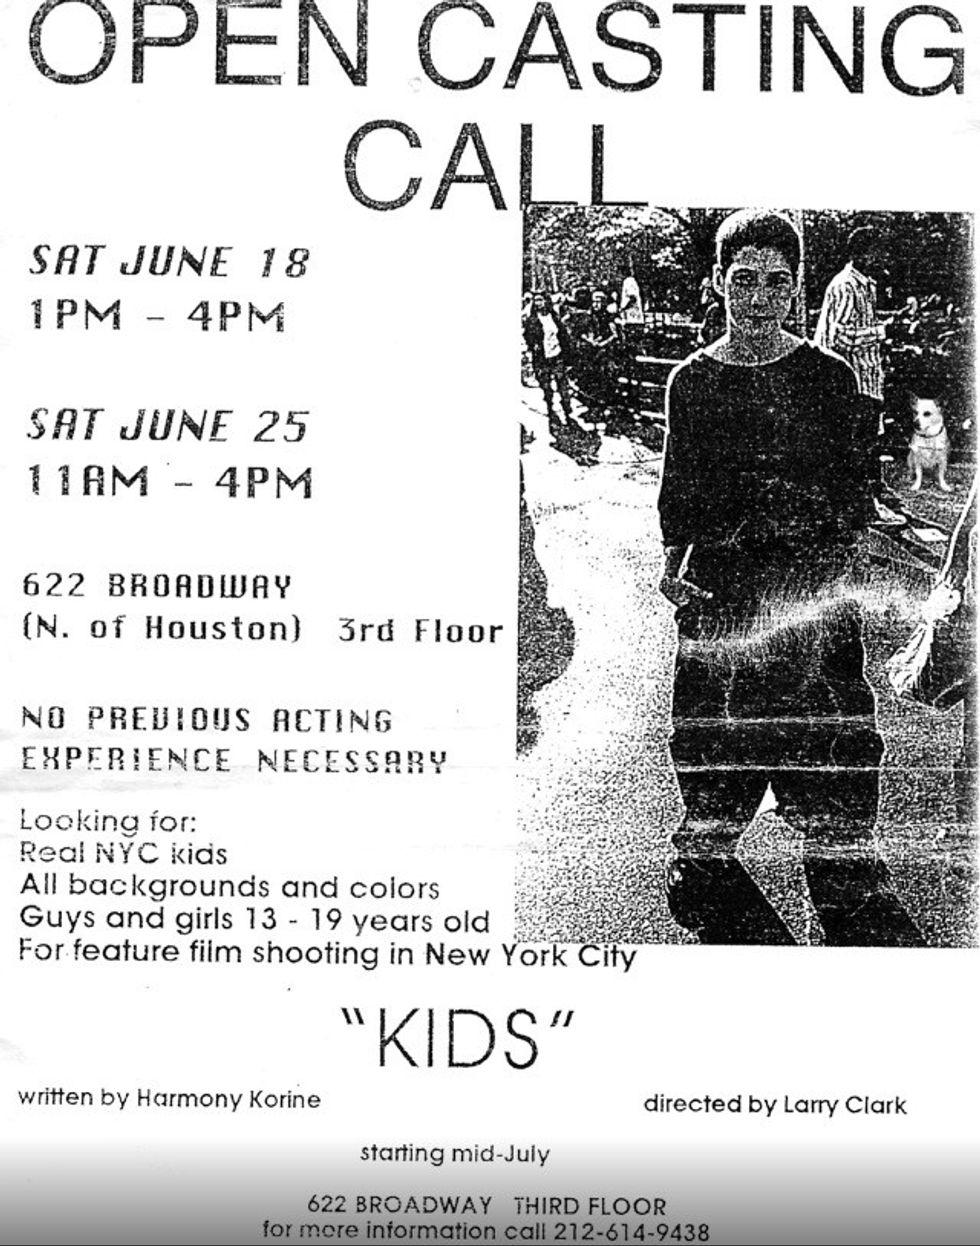 See the Original Kids Casting Call